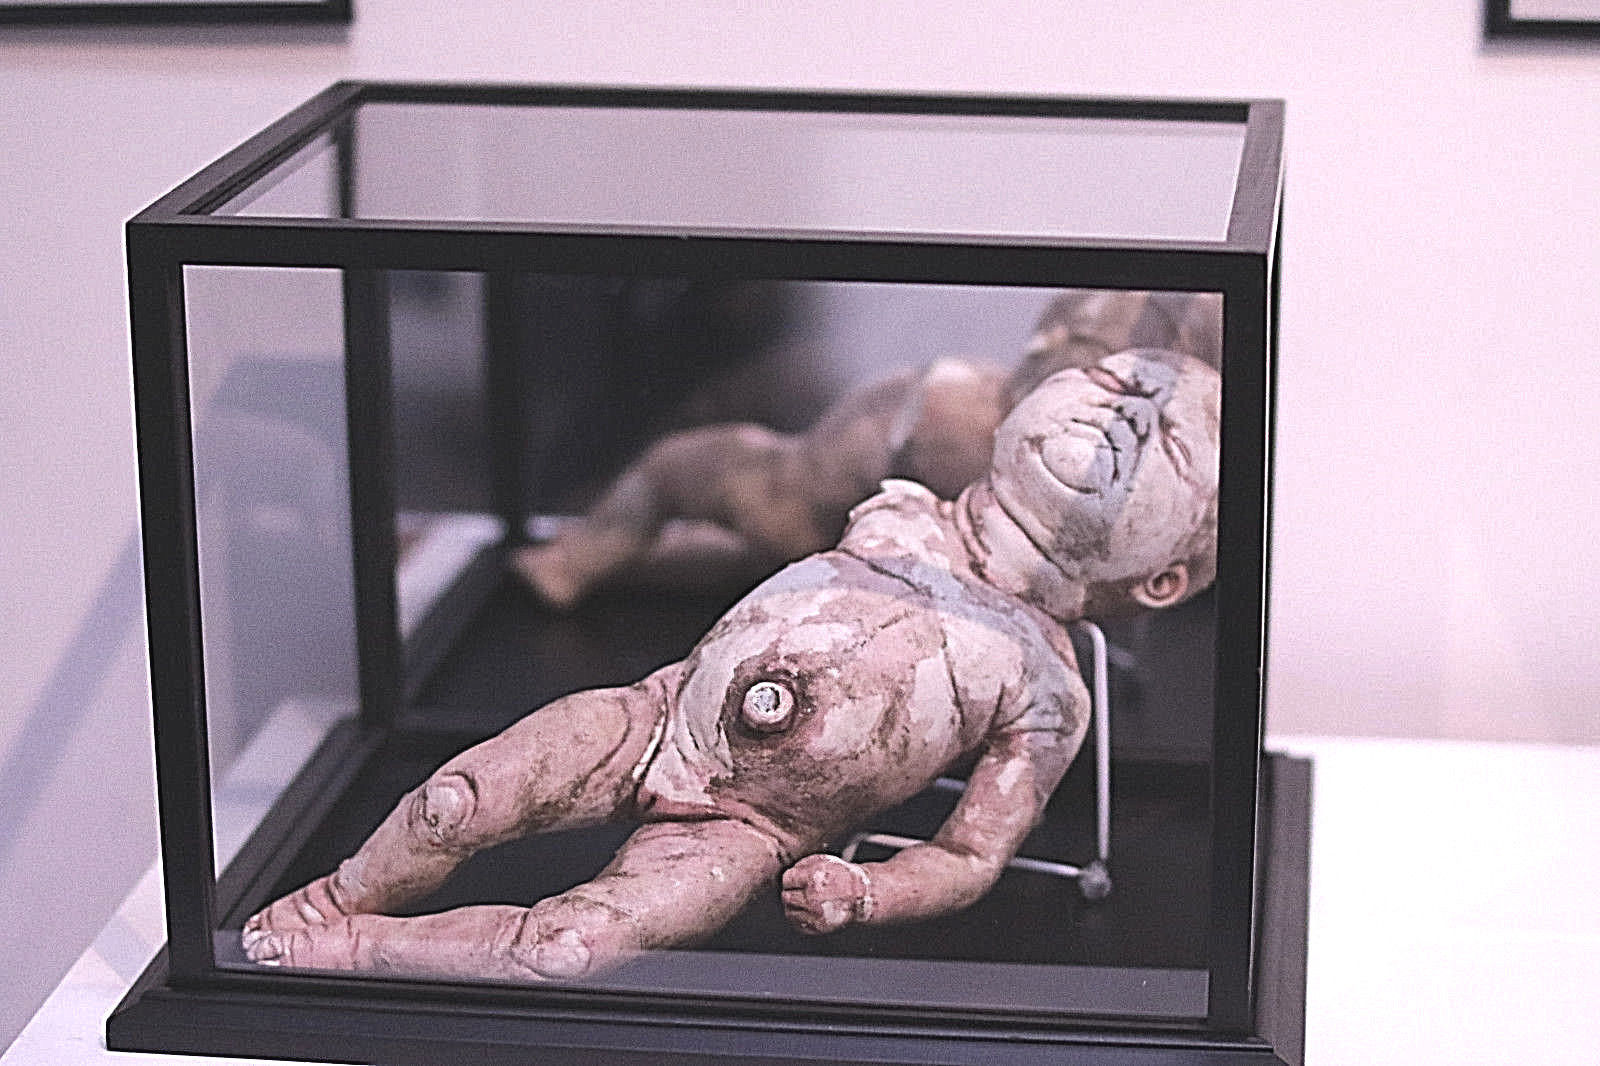 Newborn porn